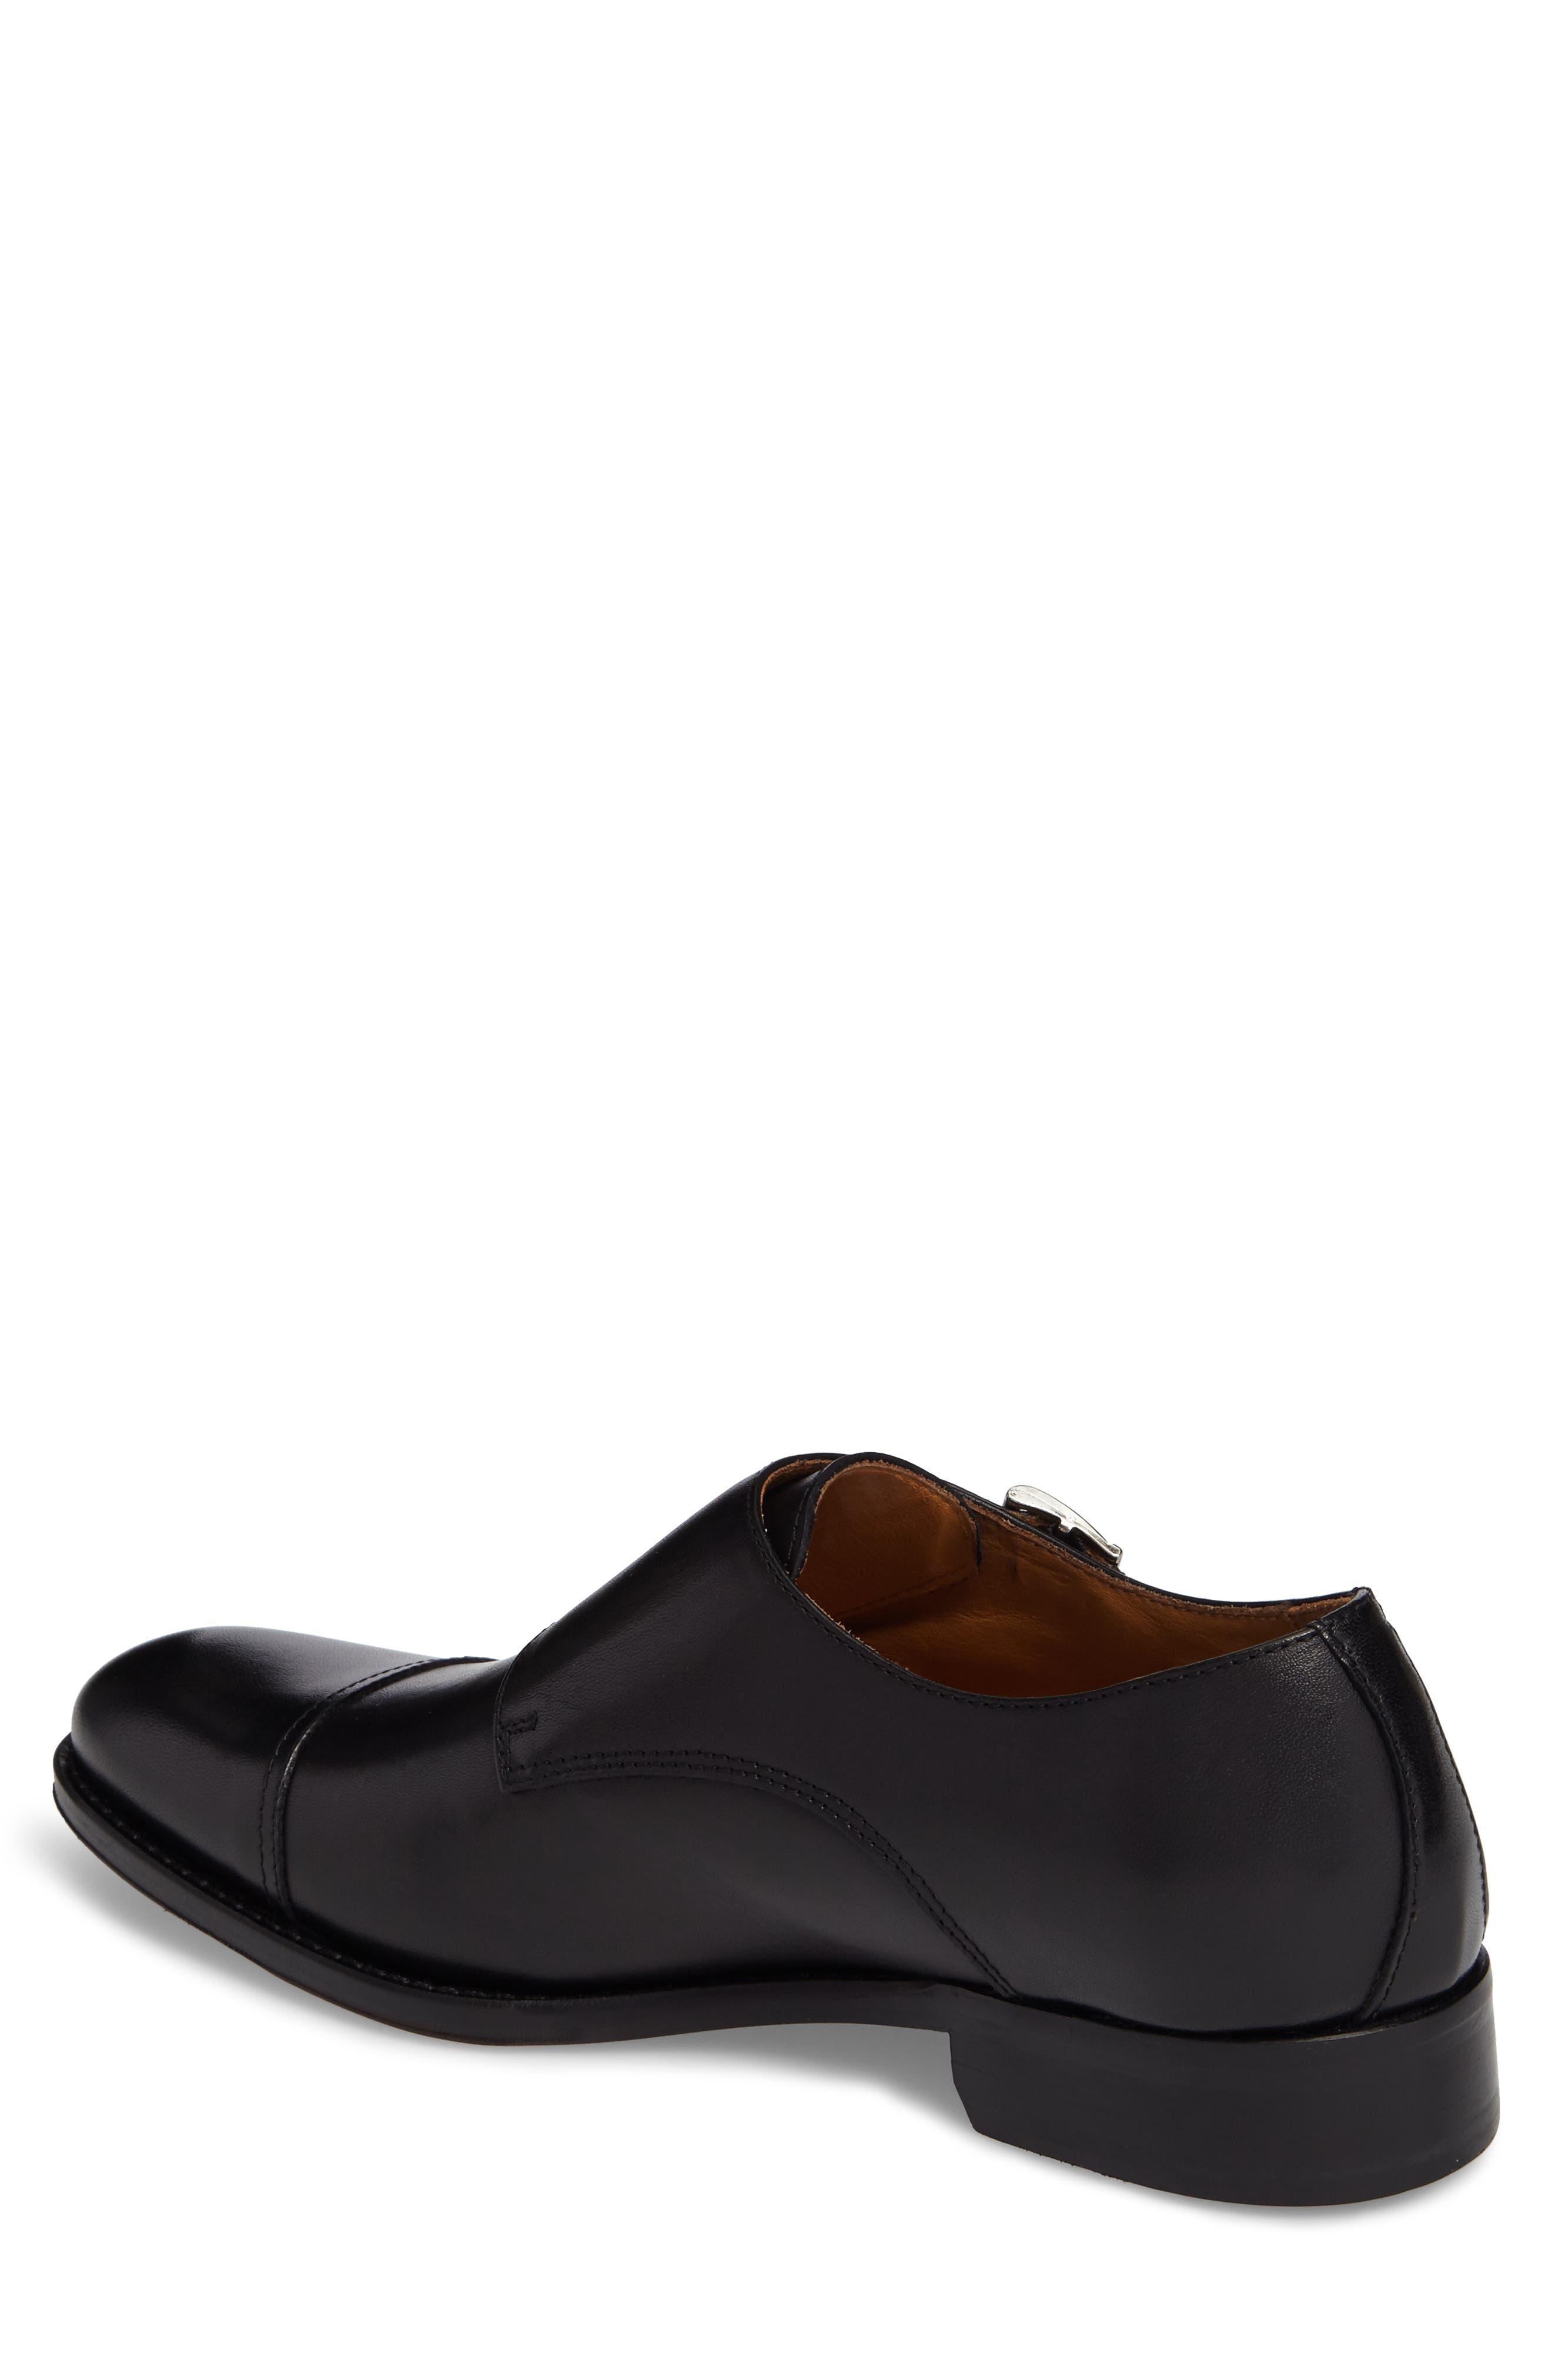 Stratton Double Monk Strap Shoe,                             Alternate thumbnail 2, color,                             001